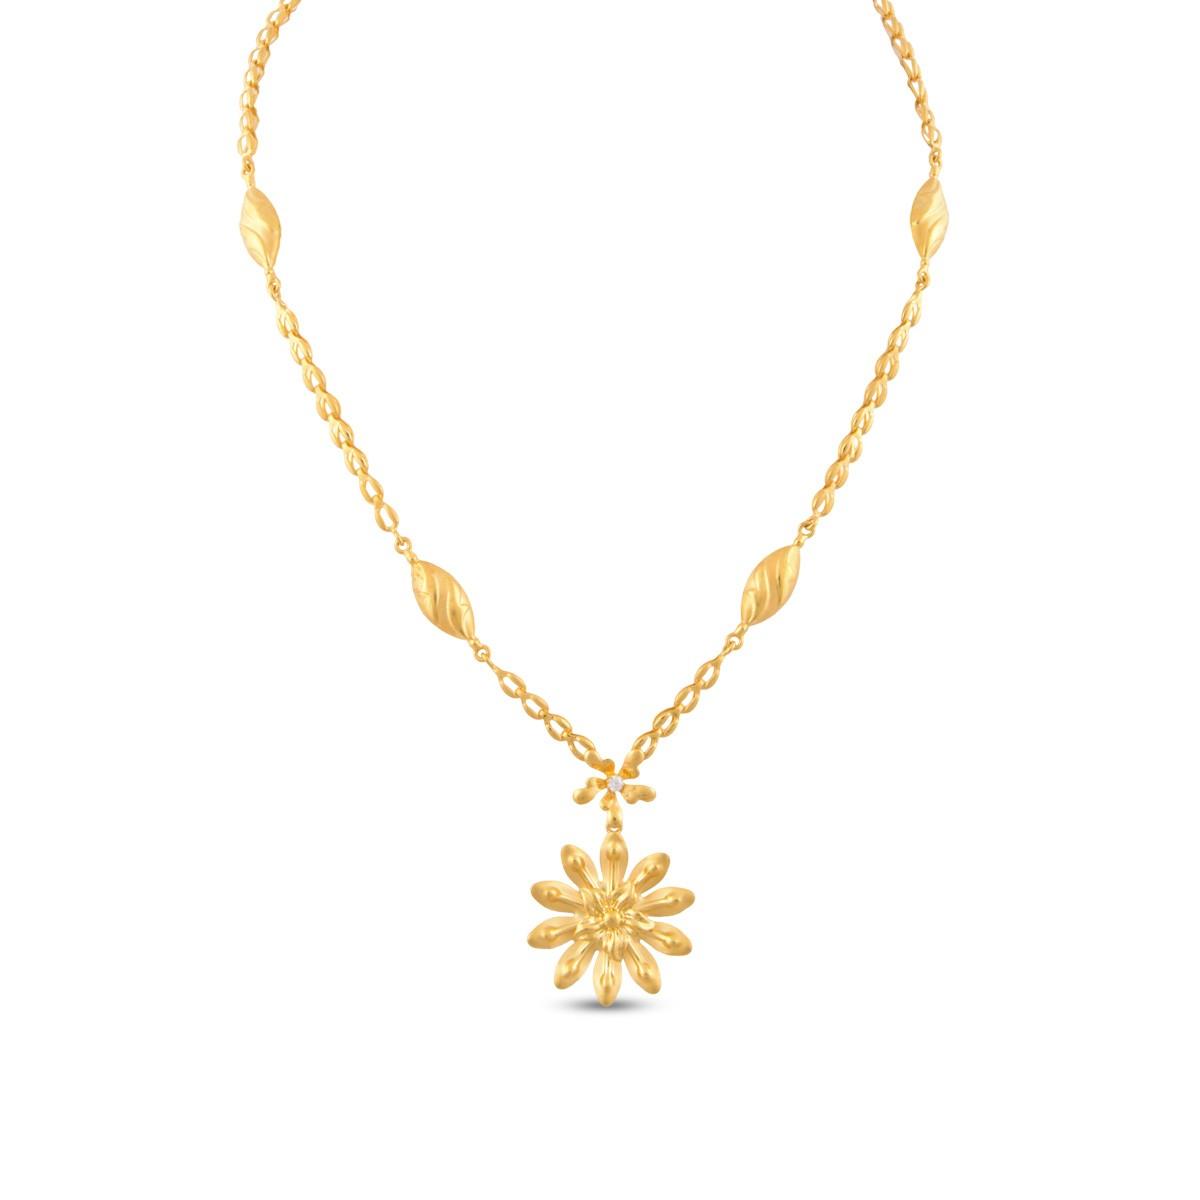 Dayita Gold Necklace